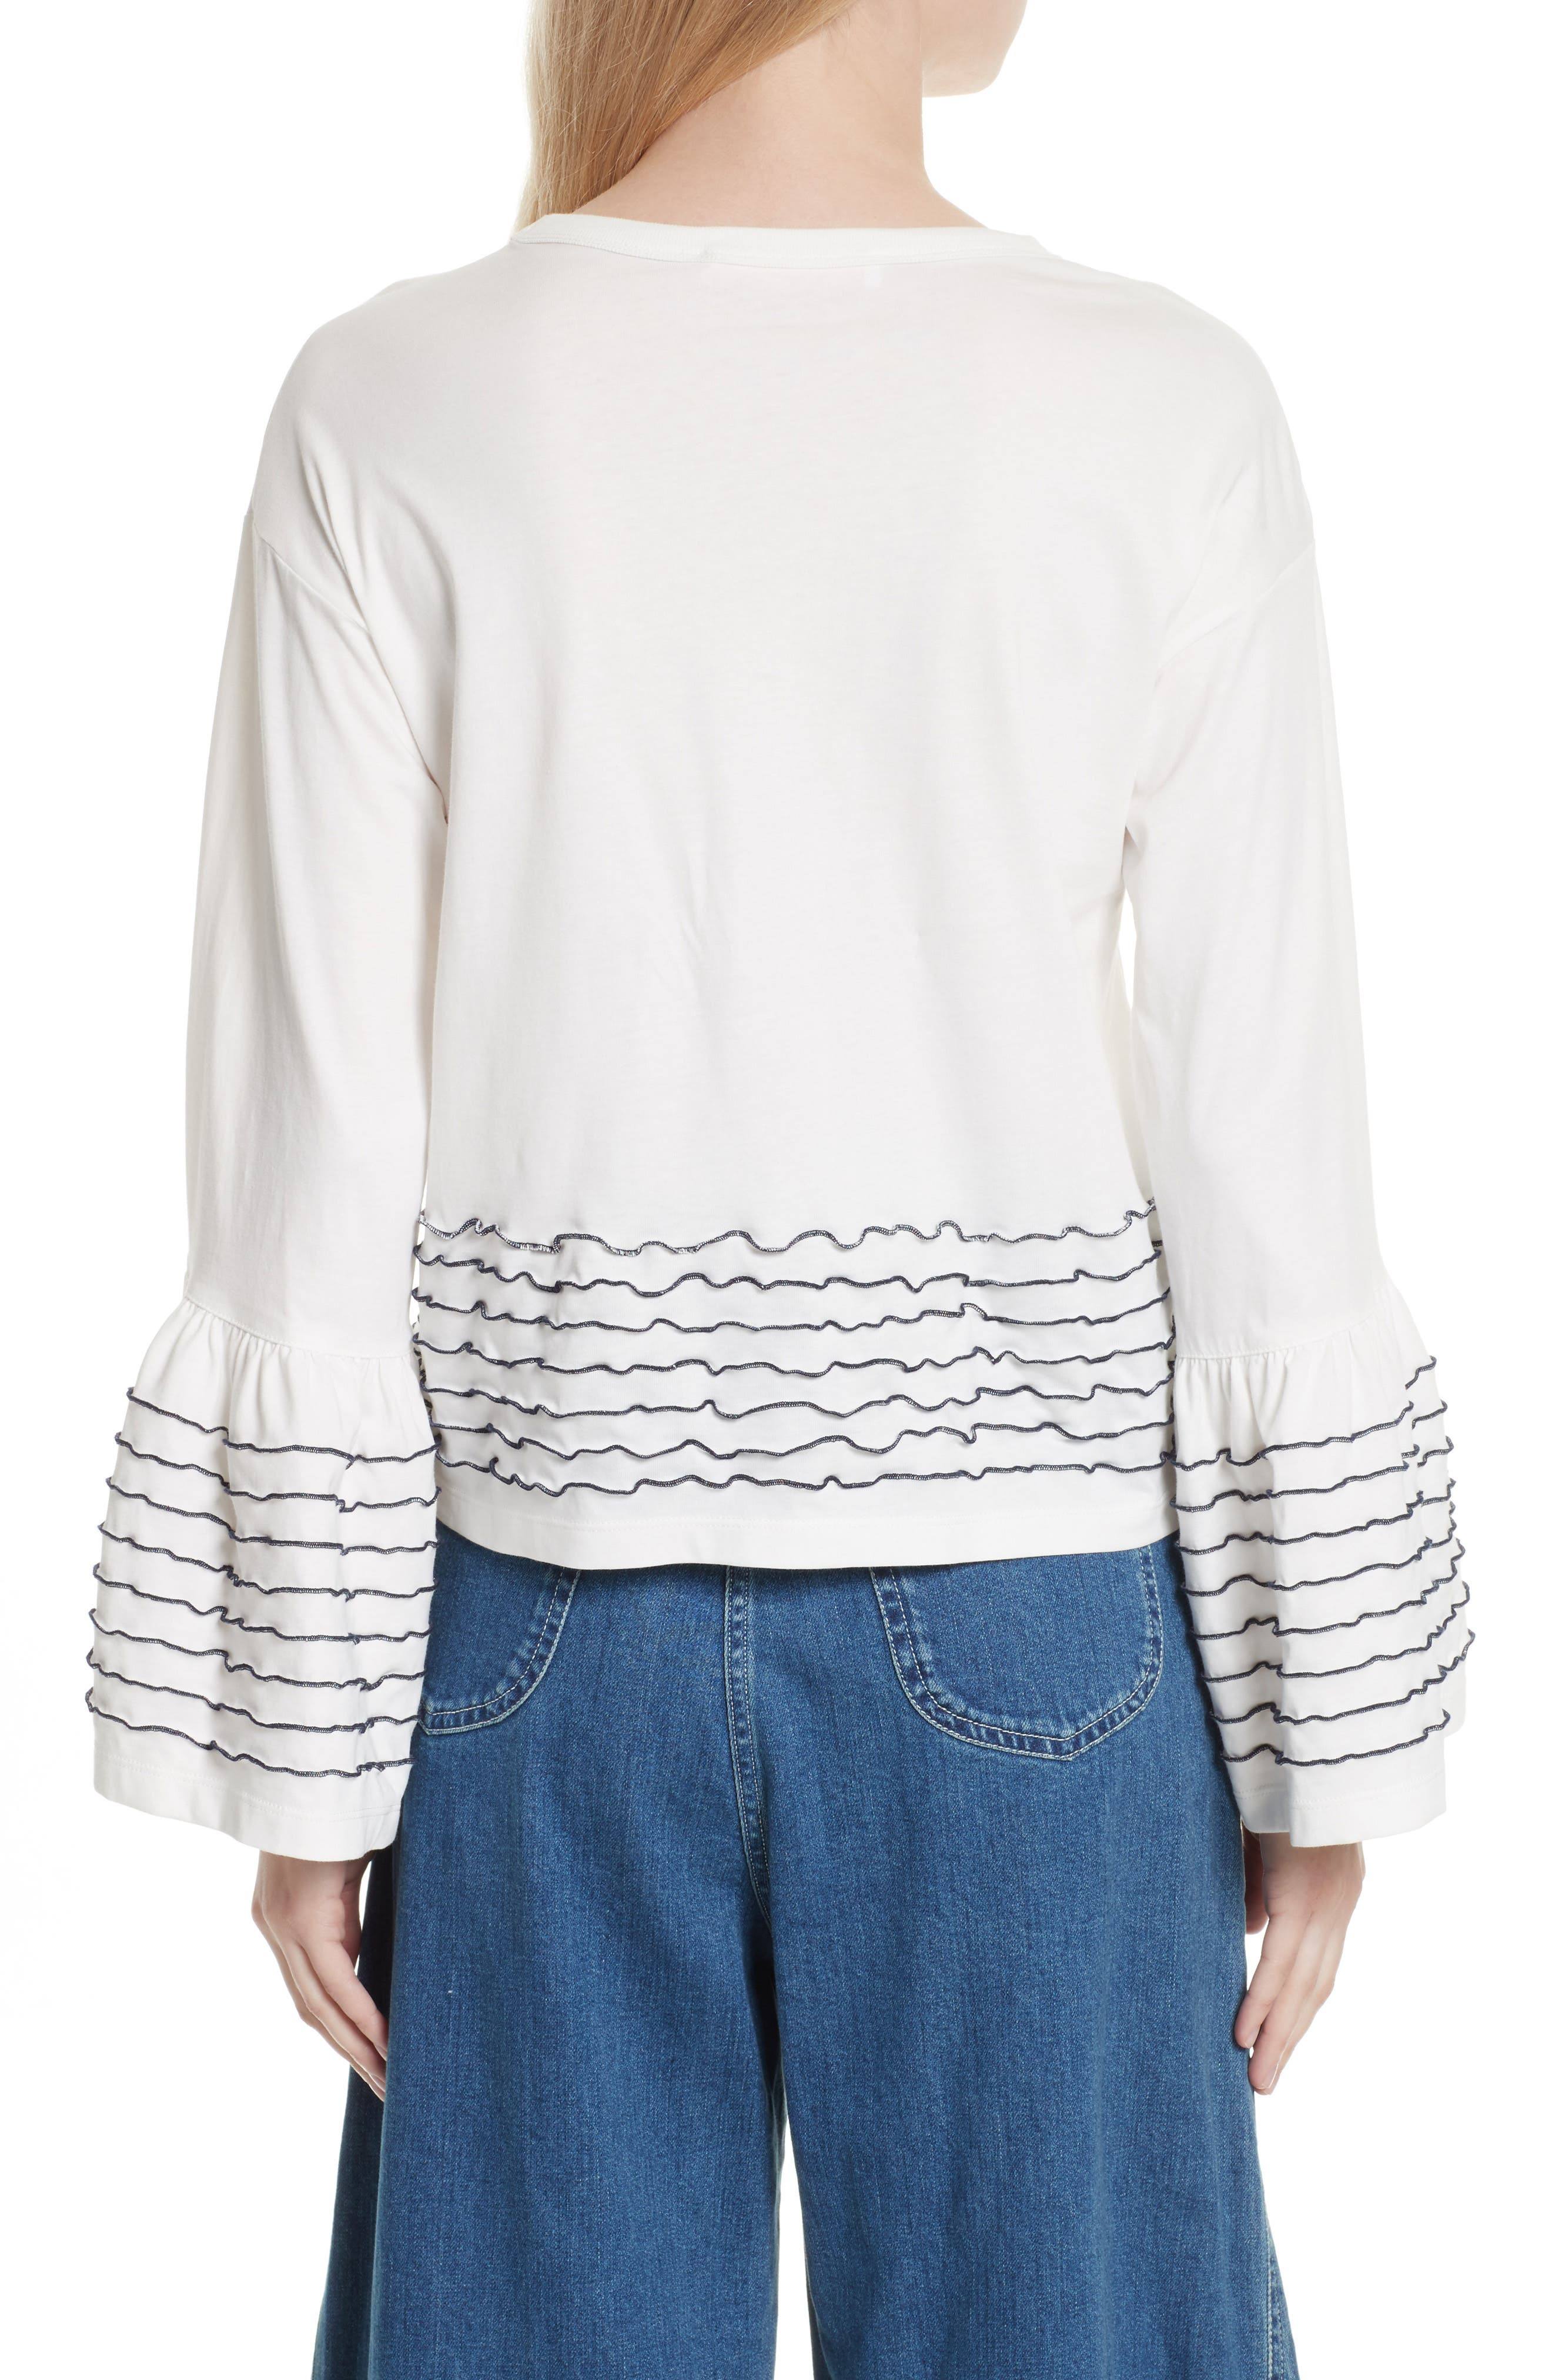 Stitched Cotton Top,                             Alternate thumbnail 2, color,